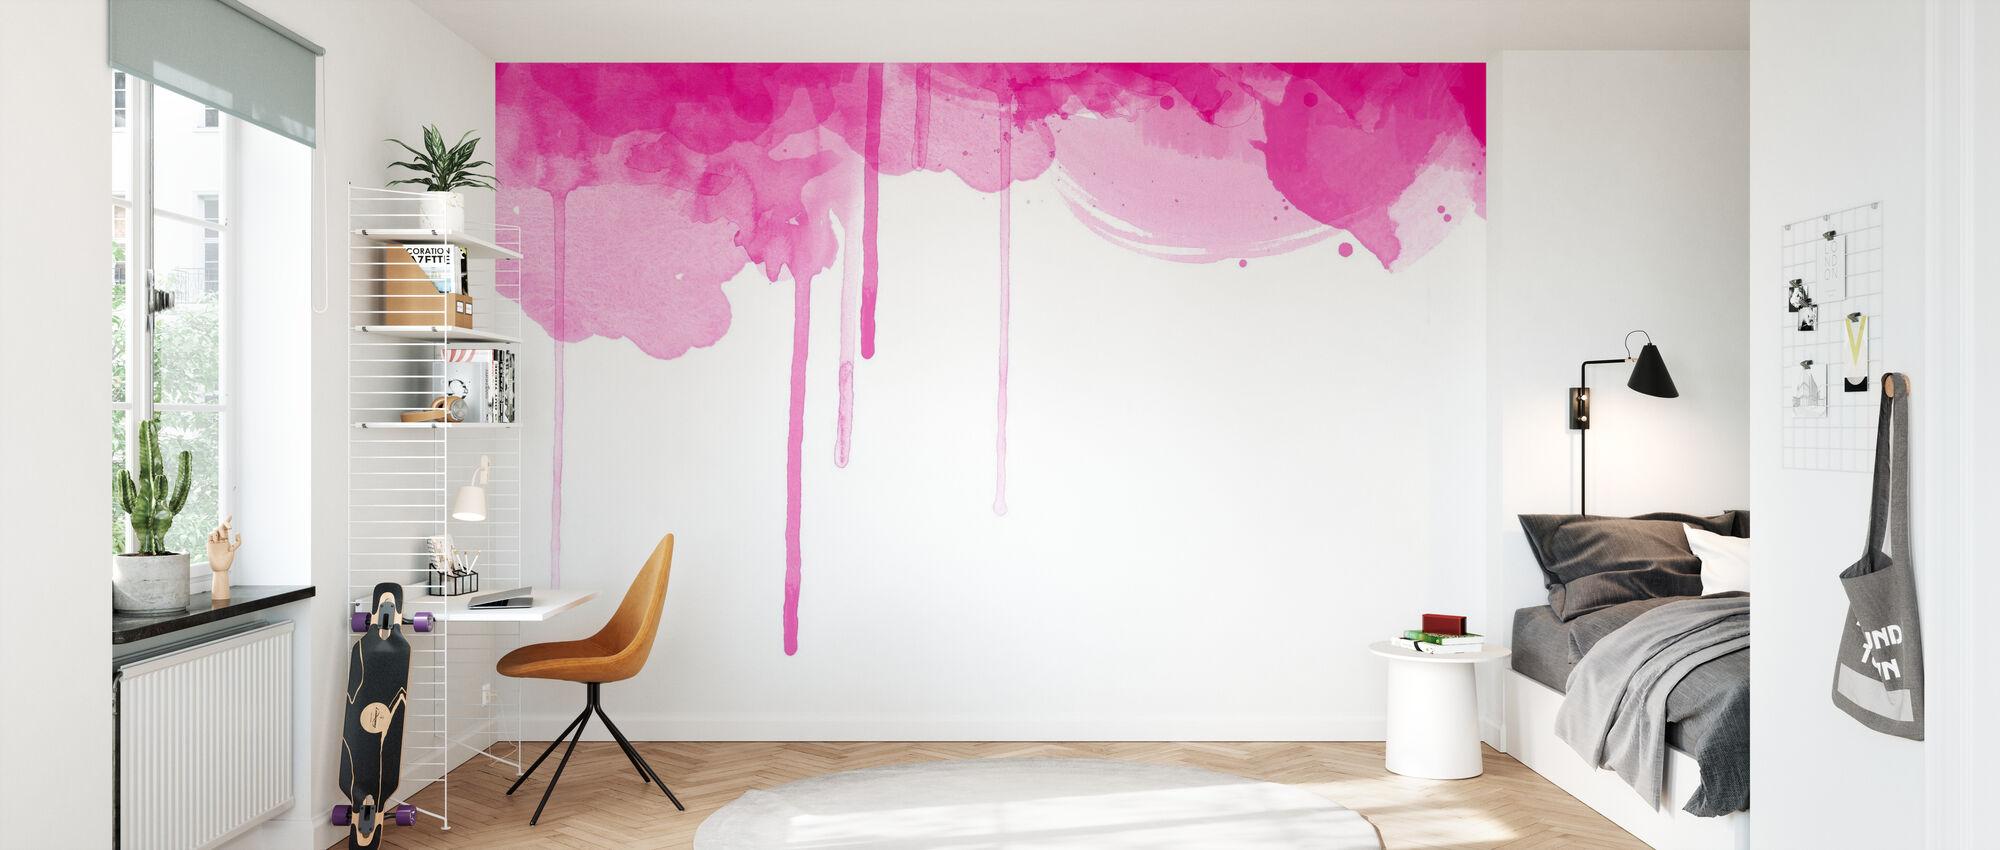 Fluent Fuchsia Watercolor - Wallpaper - Kids Room